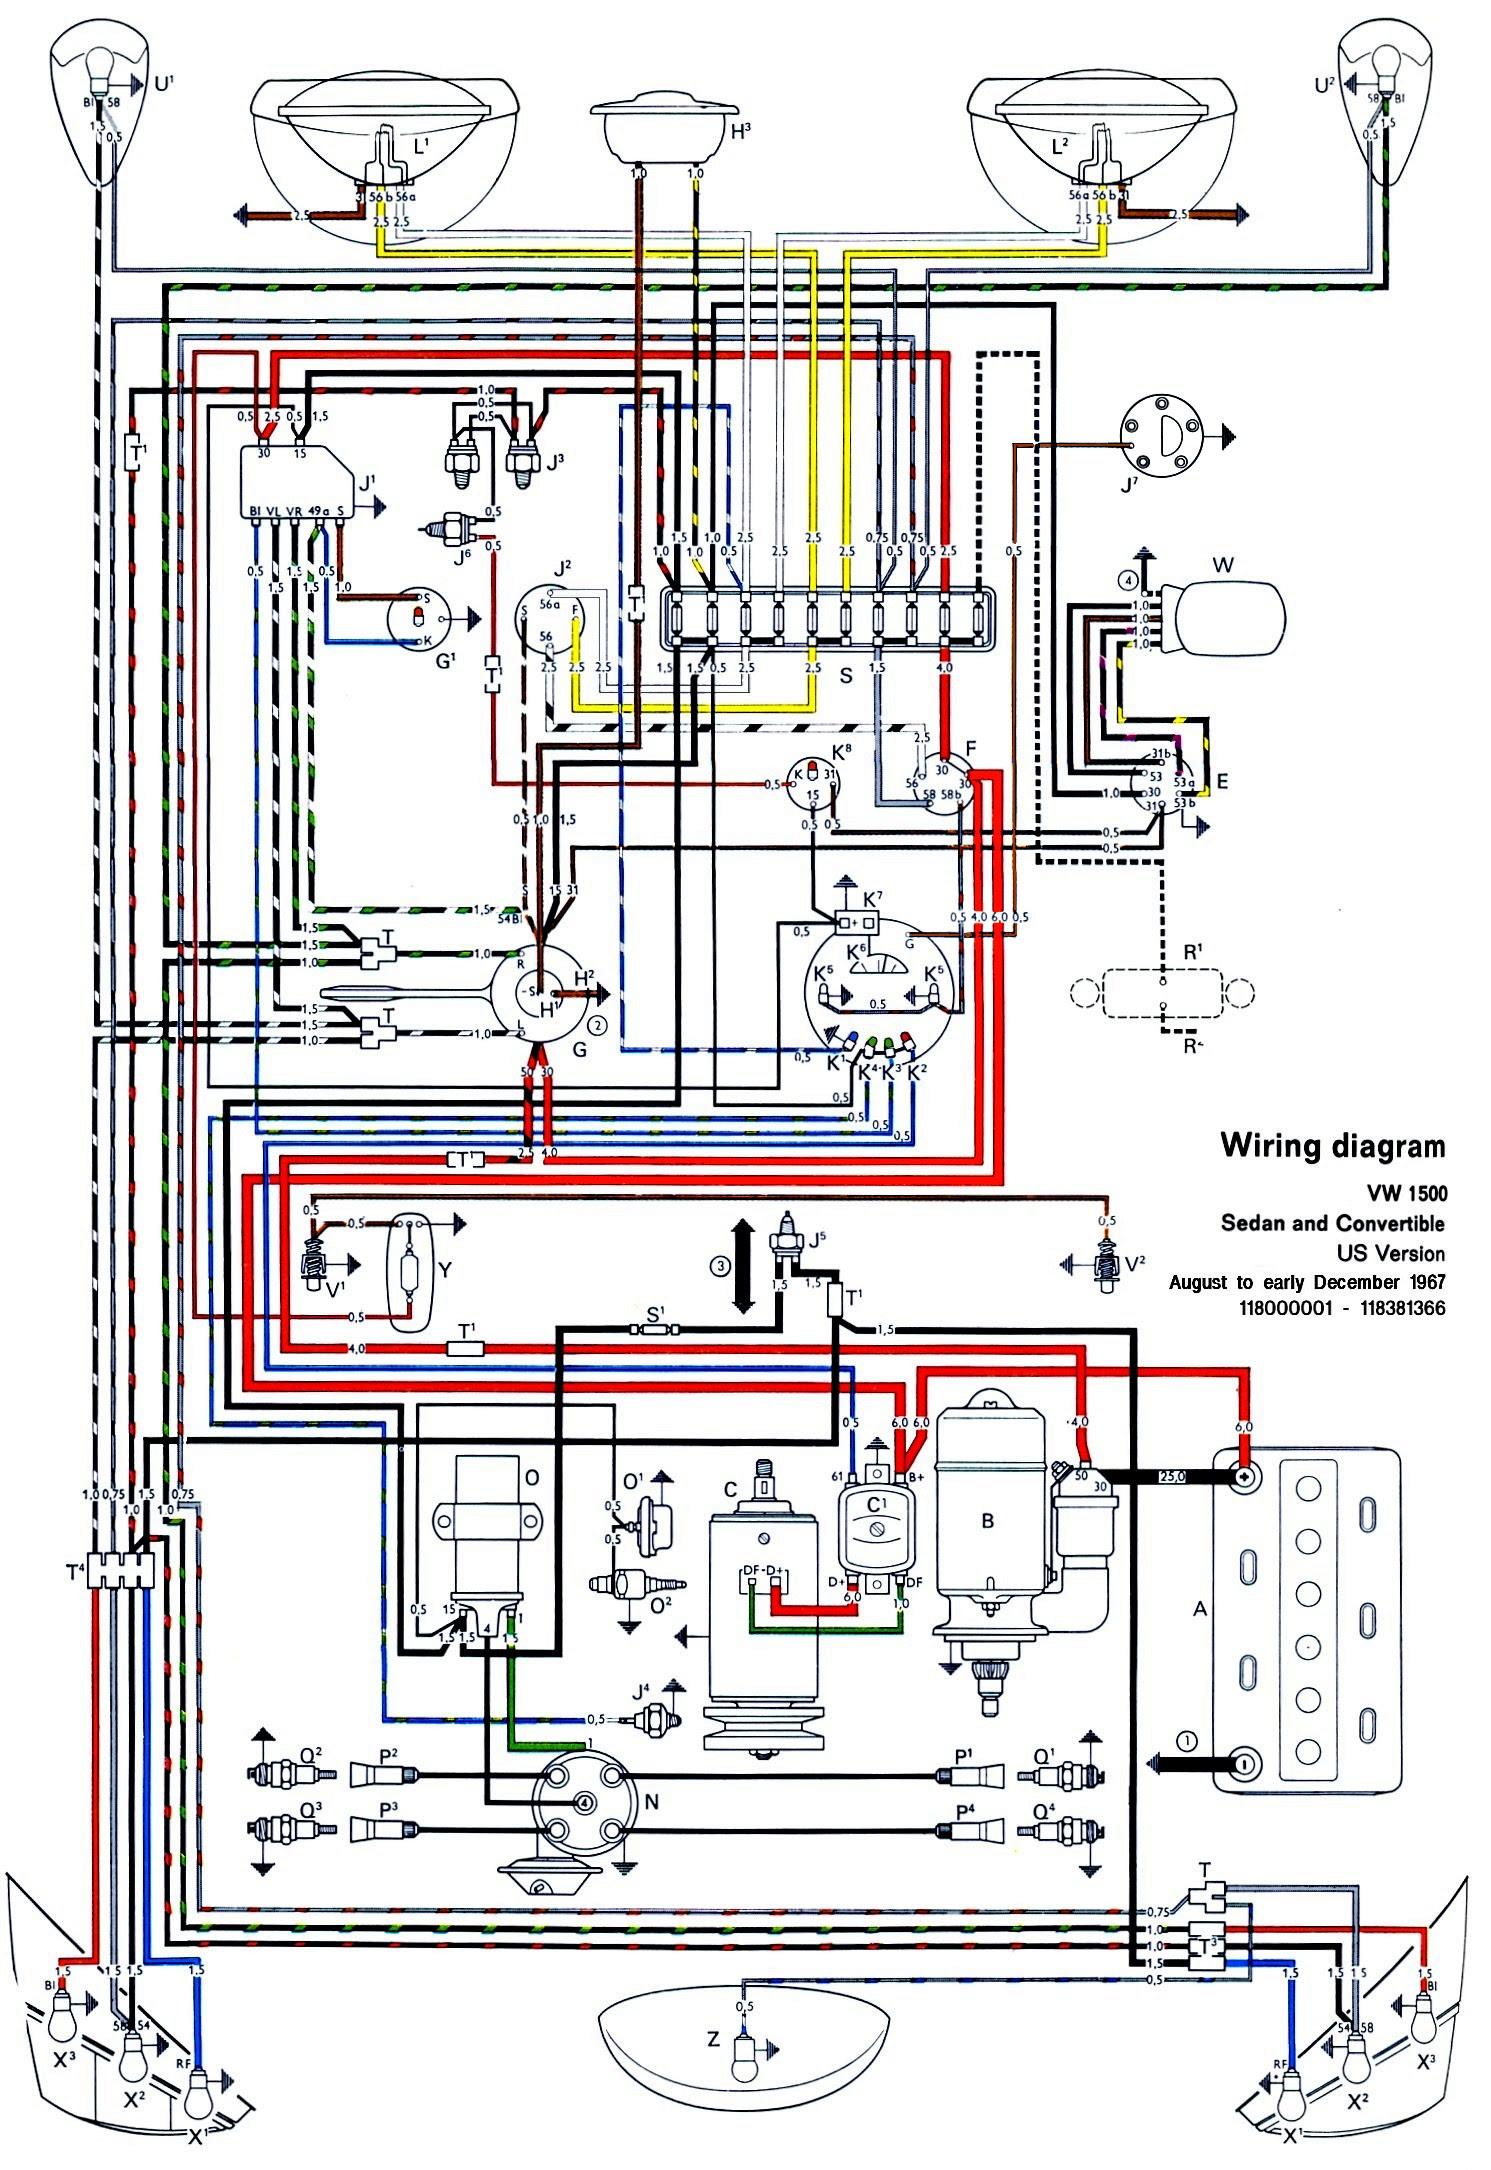 1968 Vw Bug Wiring Wiring Diagram Correction Correction Cfcarsnoleggio It